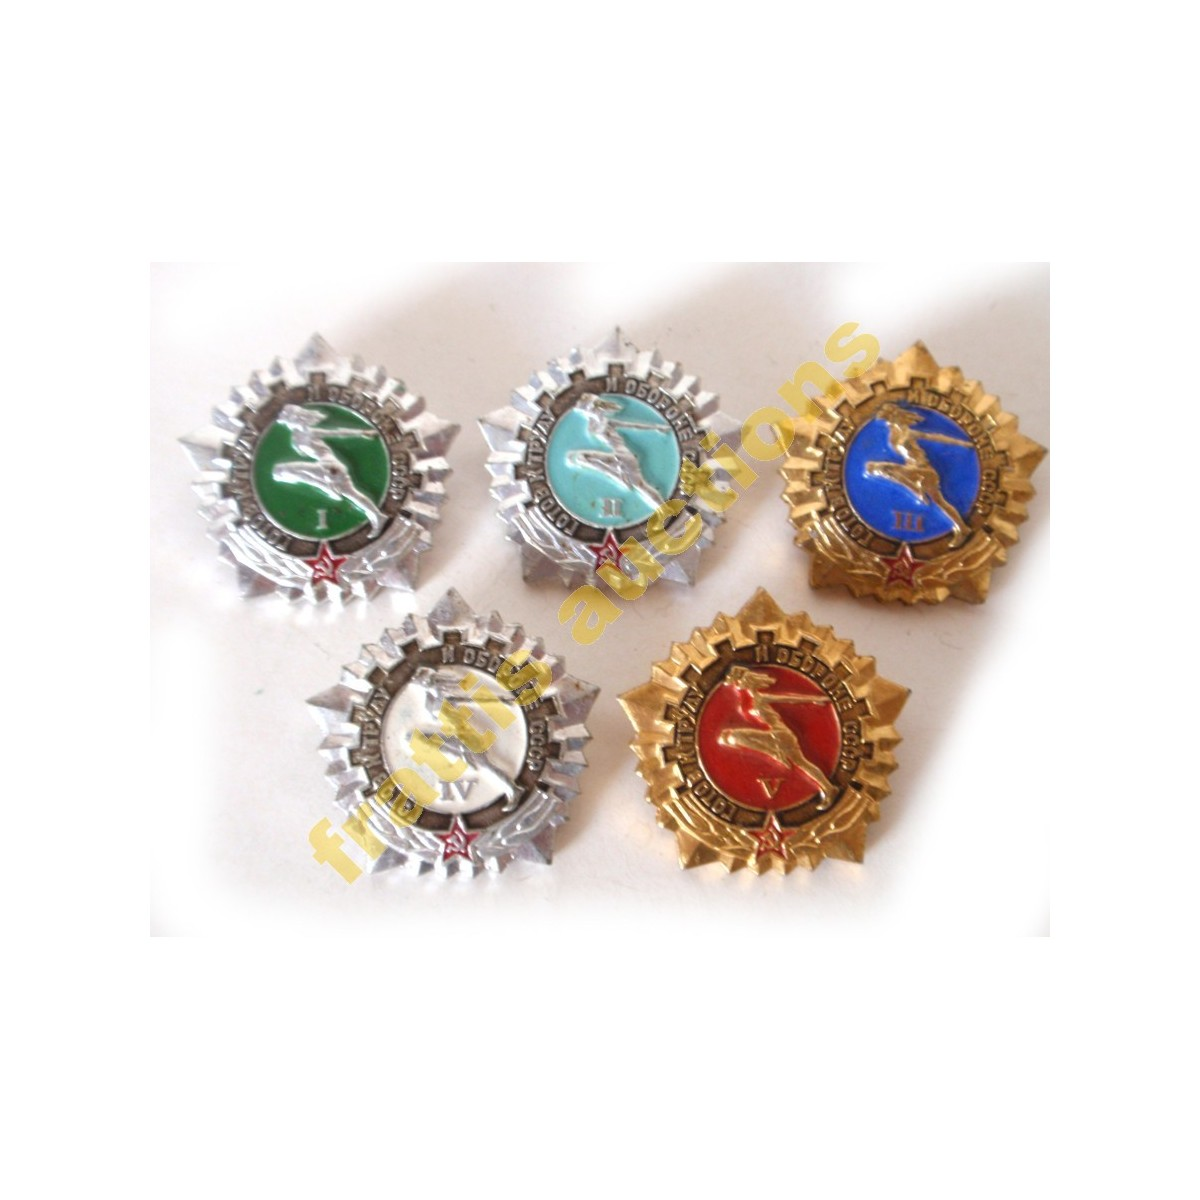 5 Pin Σοβιετικής Ένωσης.